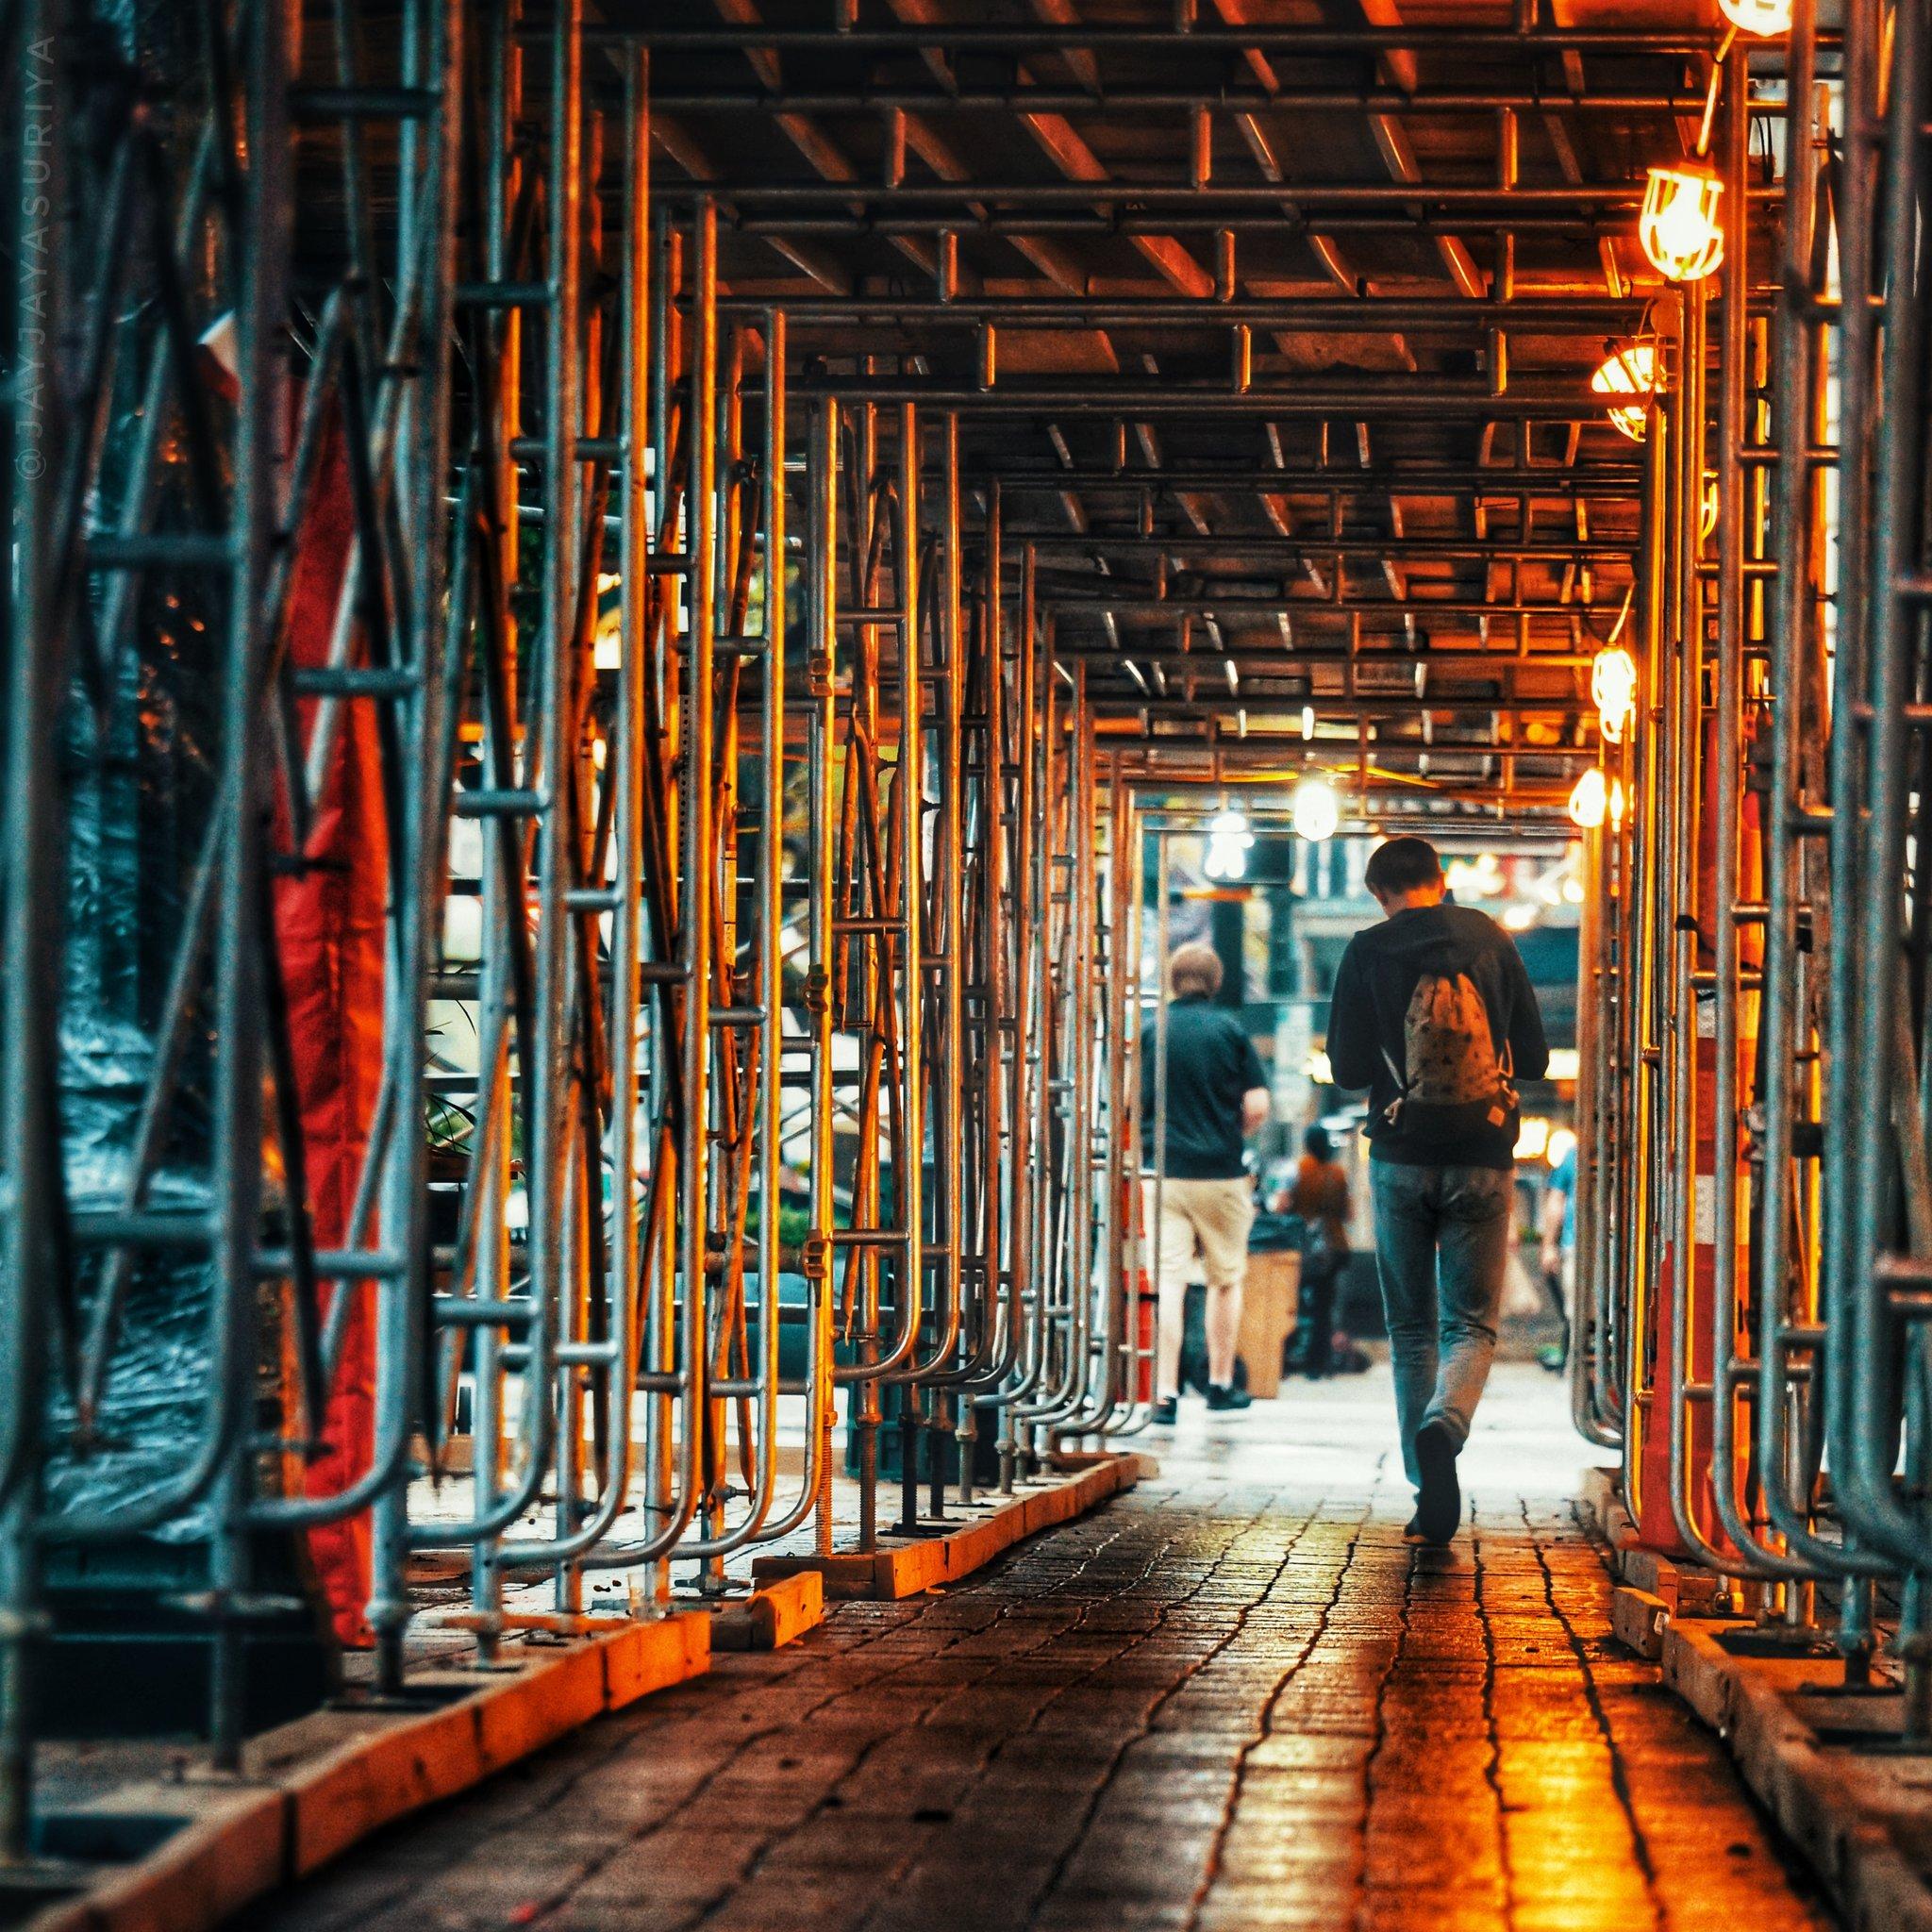 Bit of rain to cool things off early morn. love it!. Happy SXSW!!!🤘 . . #sxsw #downtownaustin #streetphotography #atx #sxsw2019 #austinstreets #construction #JayJayasuriyaphotography #streets #light https://t.co/BEeKbm7KsX